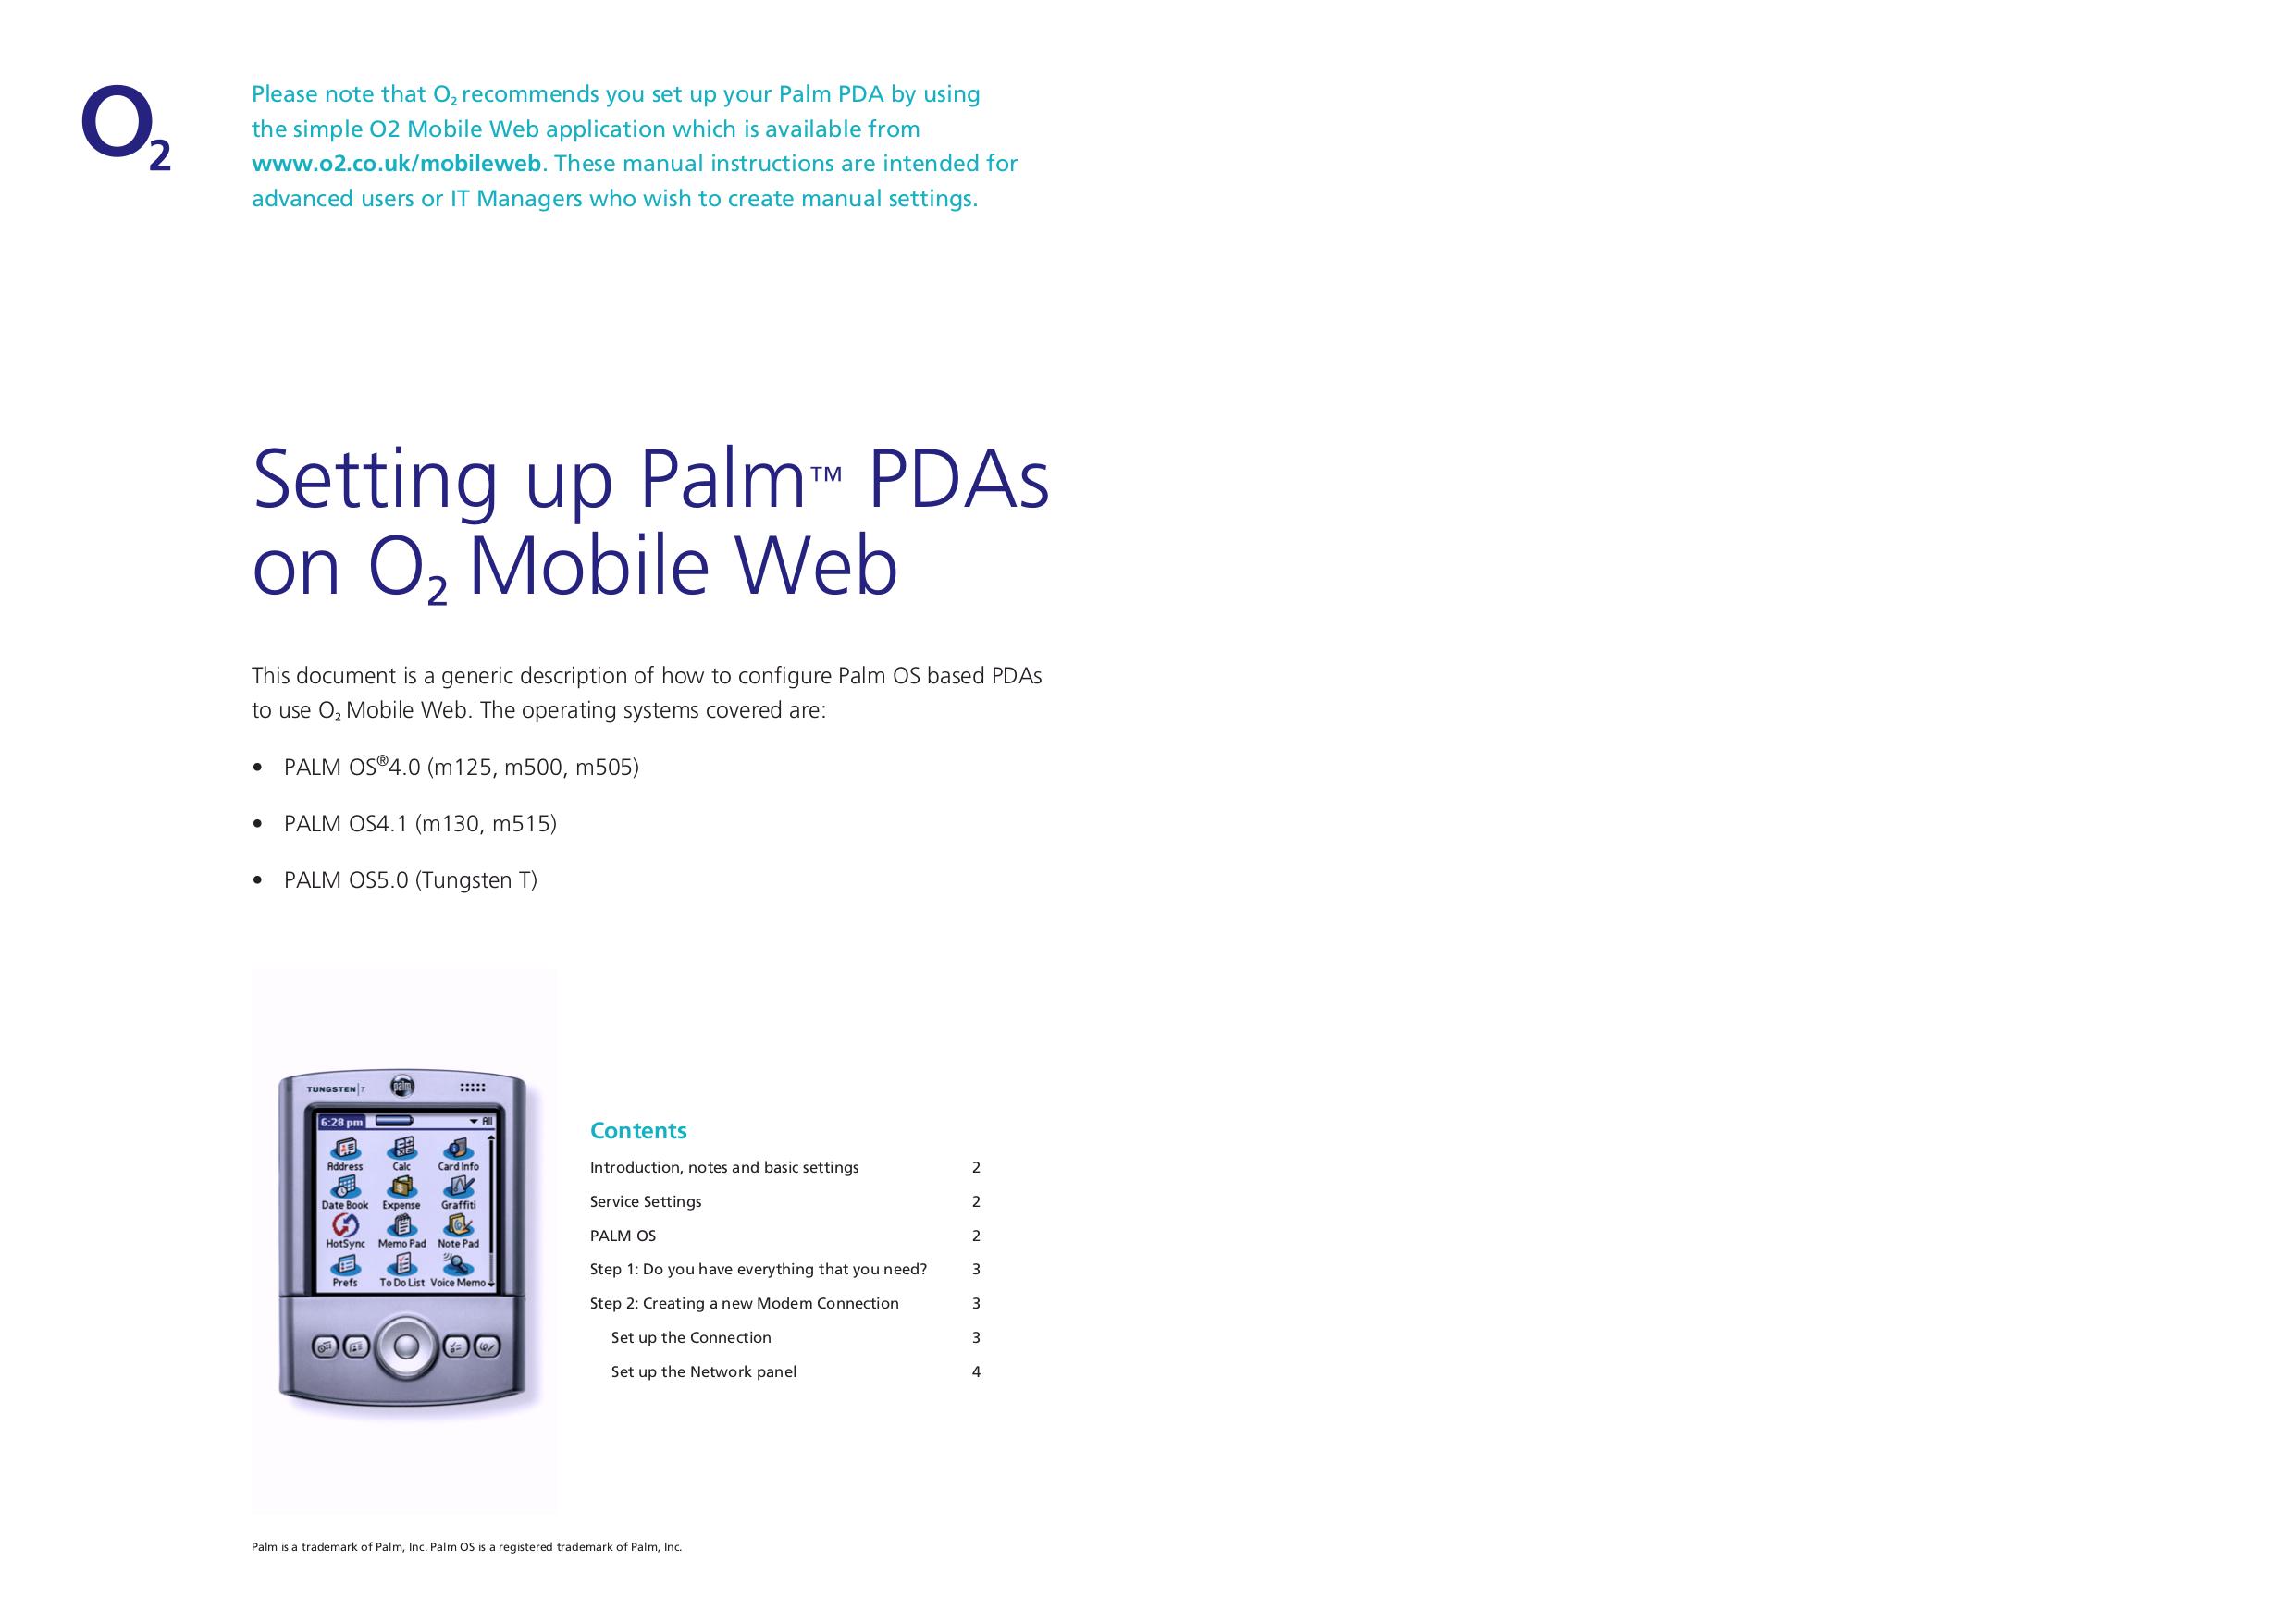 pdf for palm m pda manual pdf for palm pda m505 manual